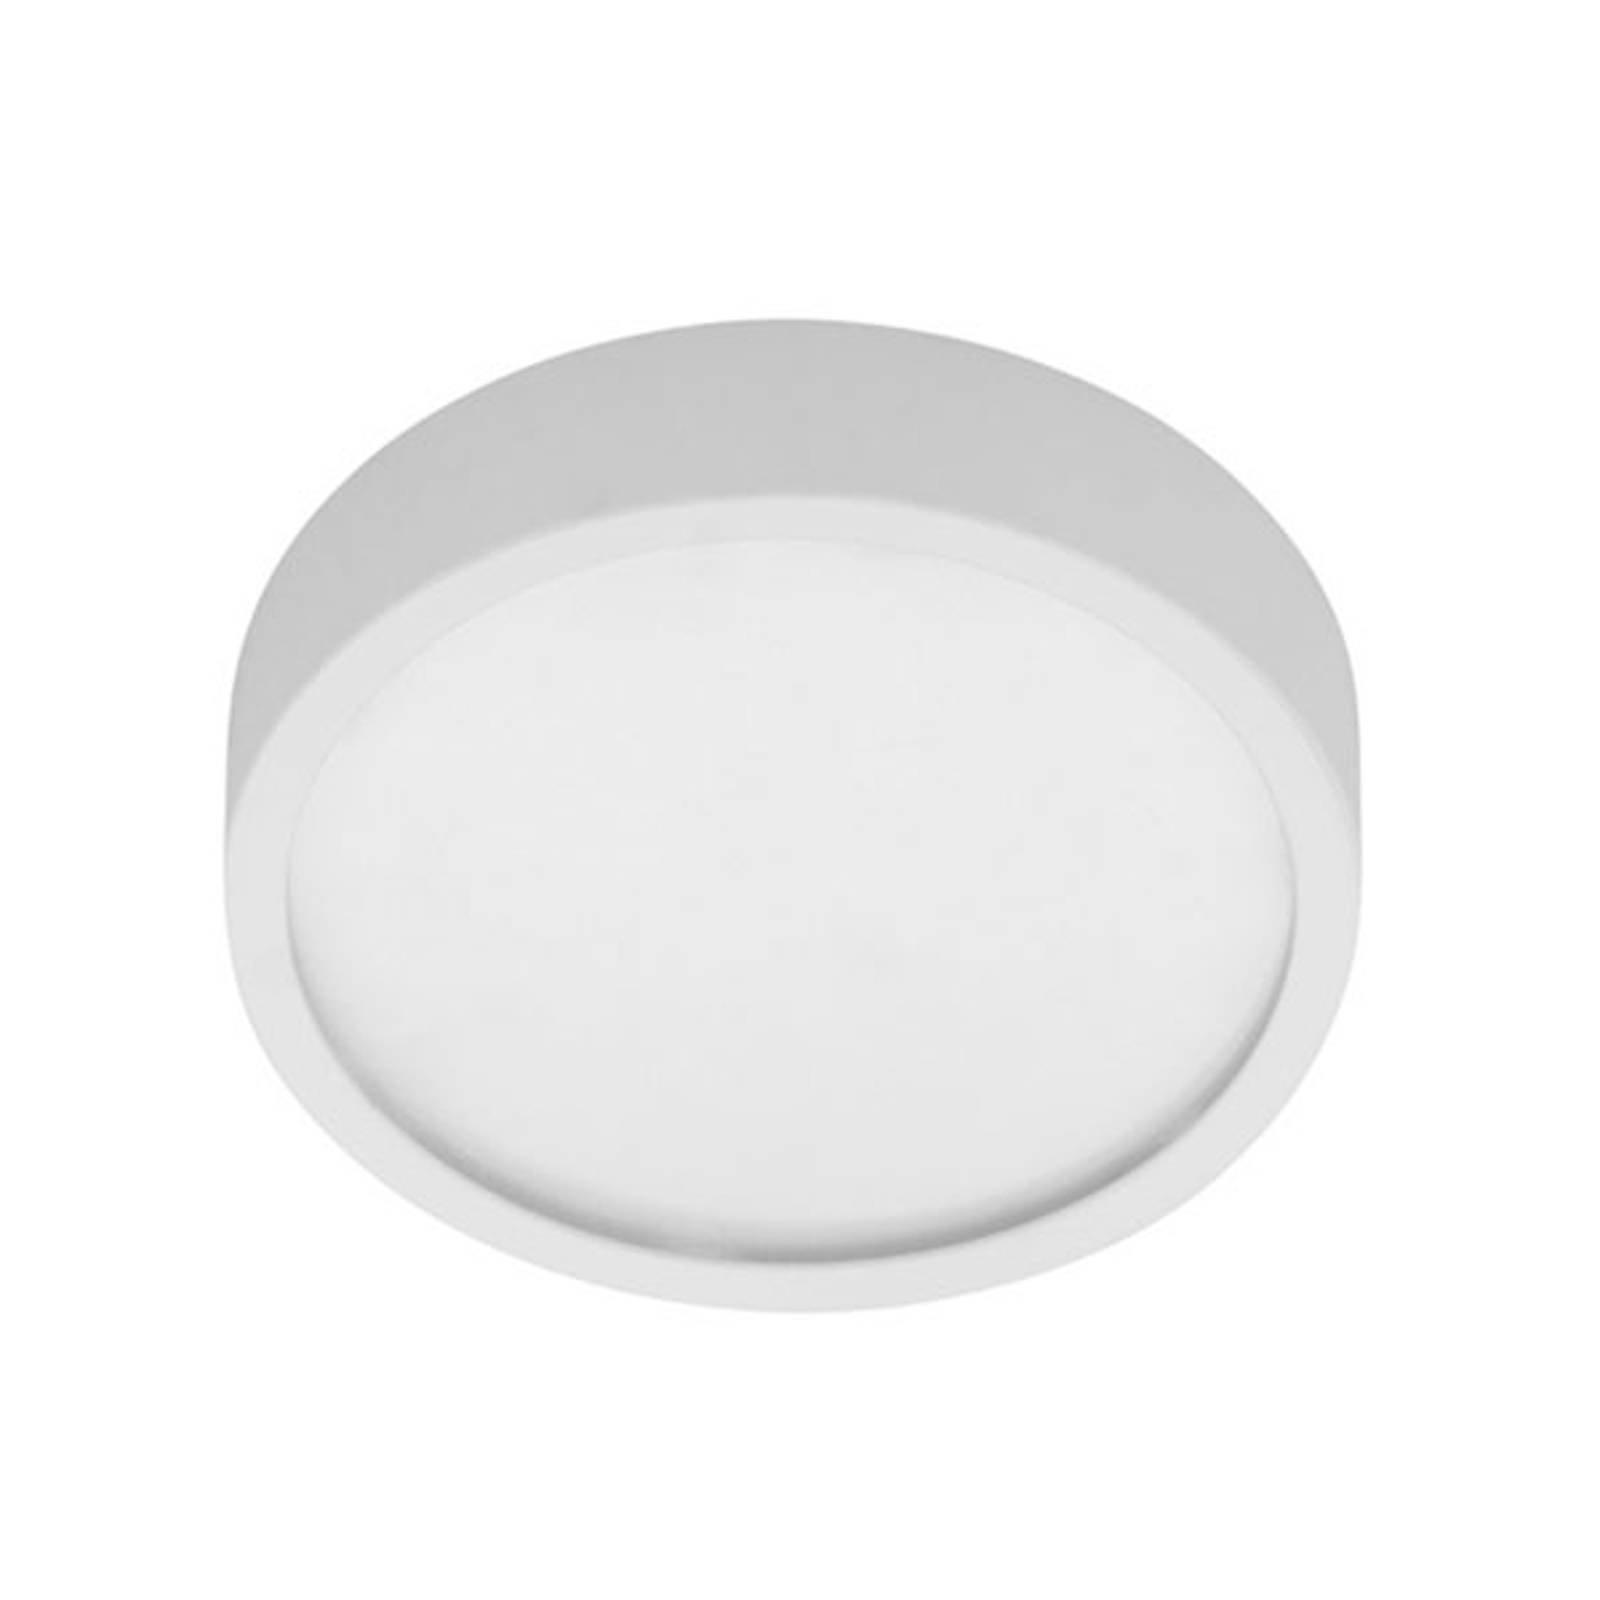 LED-taklampe rund BAP-egnet, 14 W 4 000 K